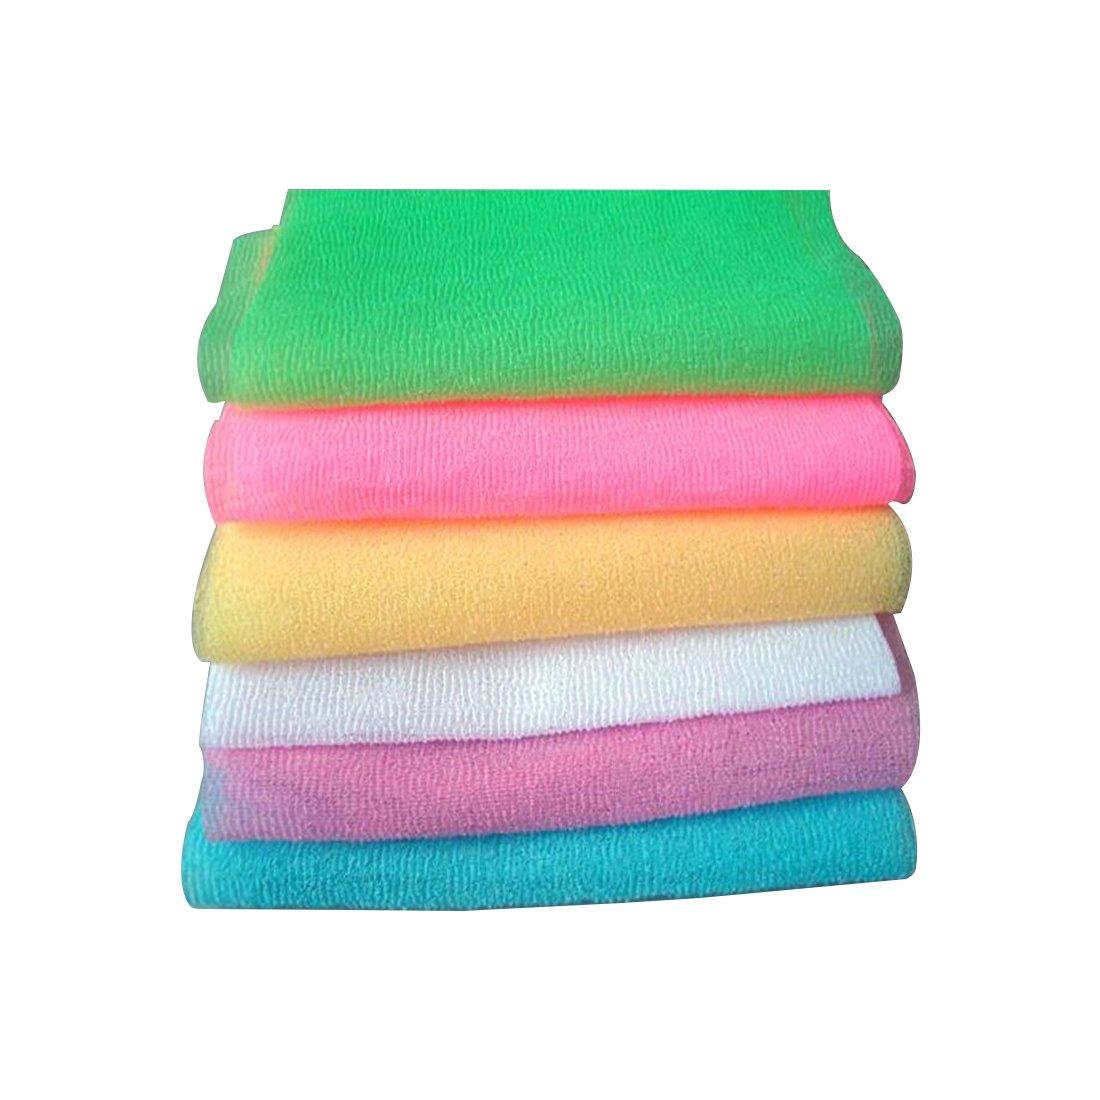 Bath Shower Nylon Scrubbing Towel Skin Cleaning Exfoliating Sponges Fashion Life